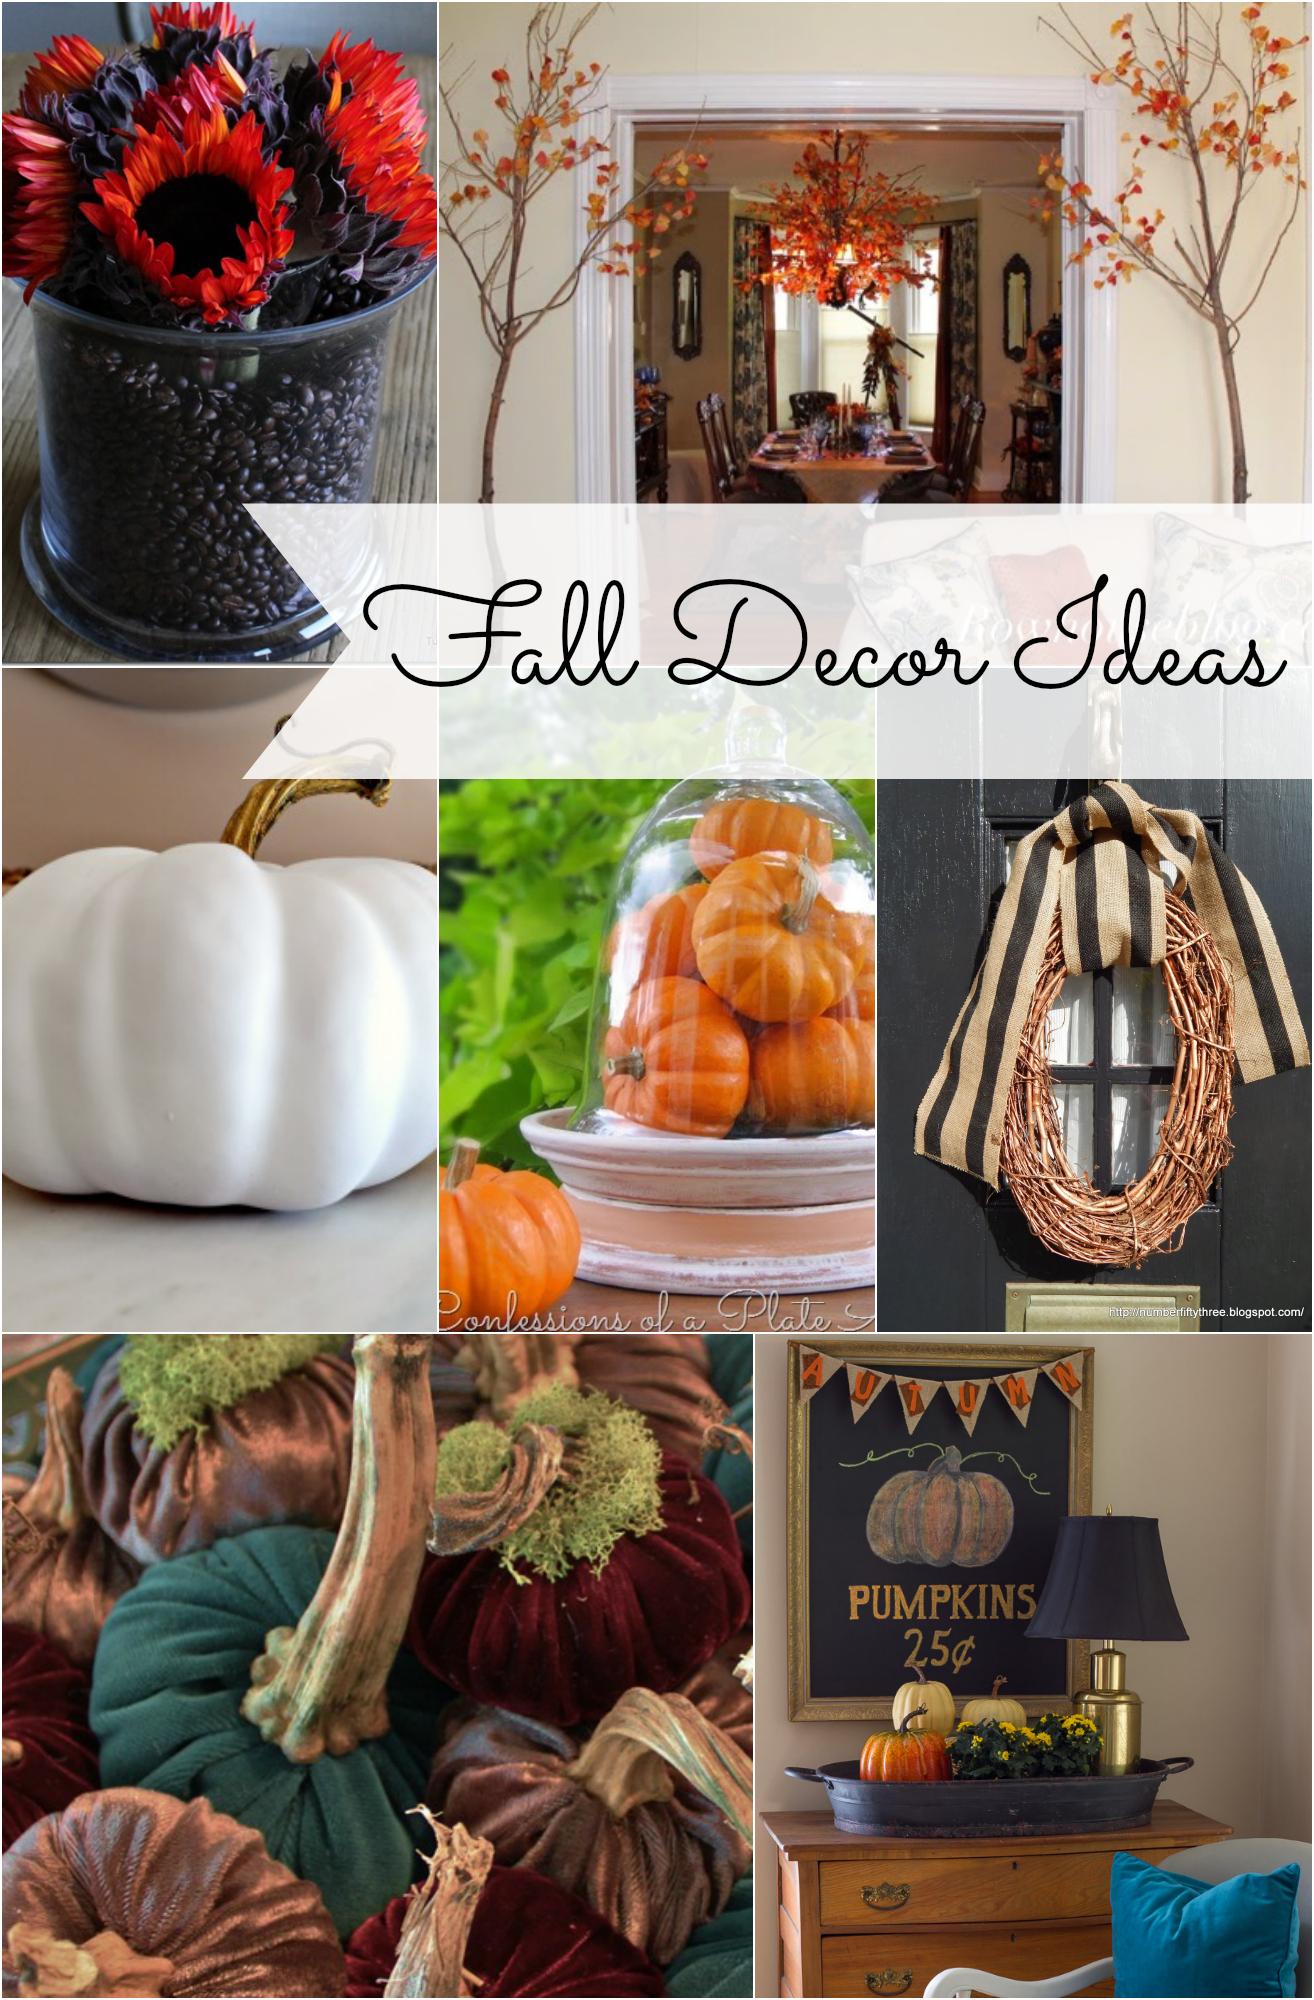 Autumn ideas for home.